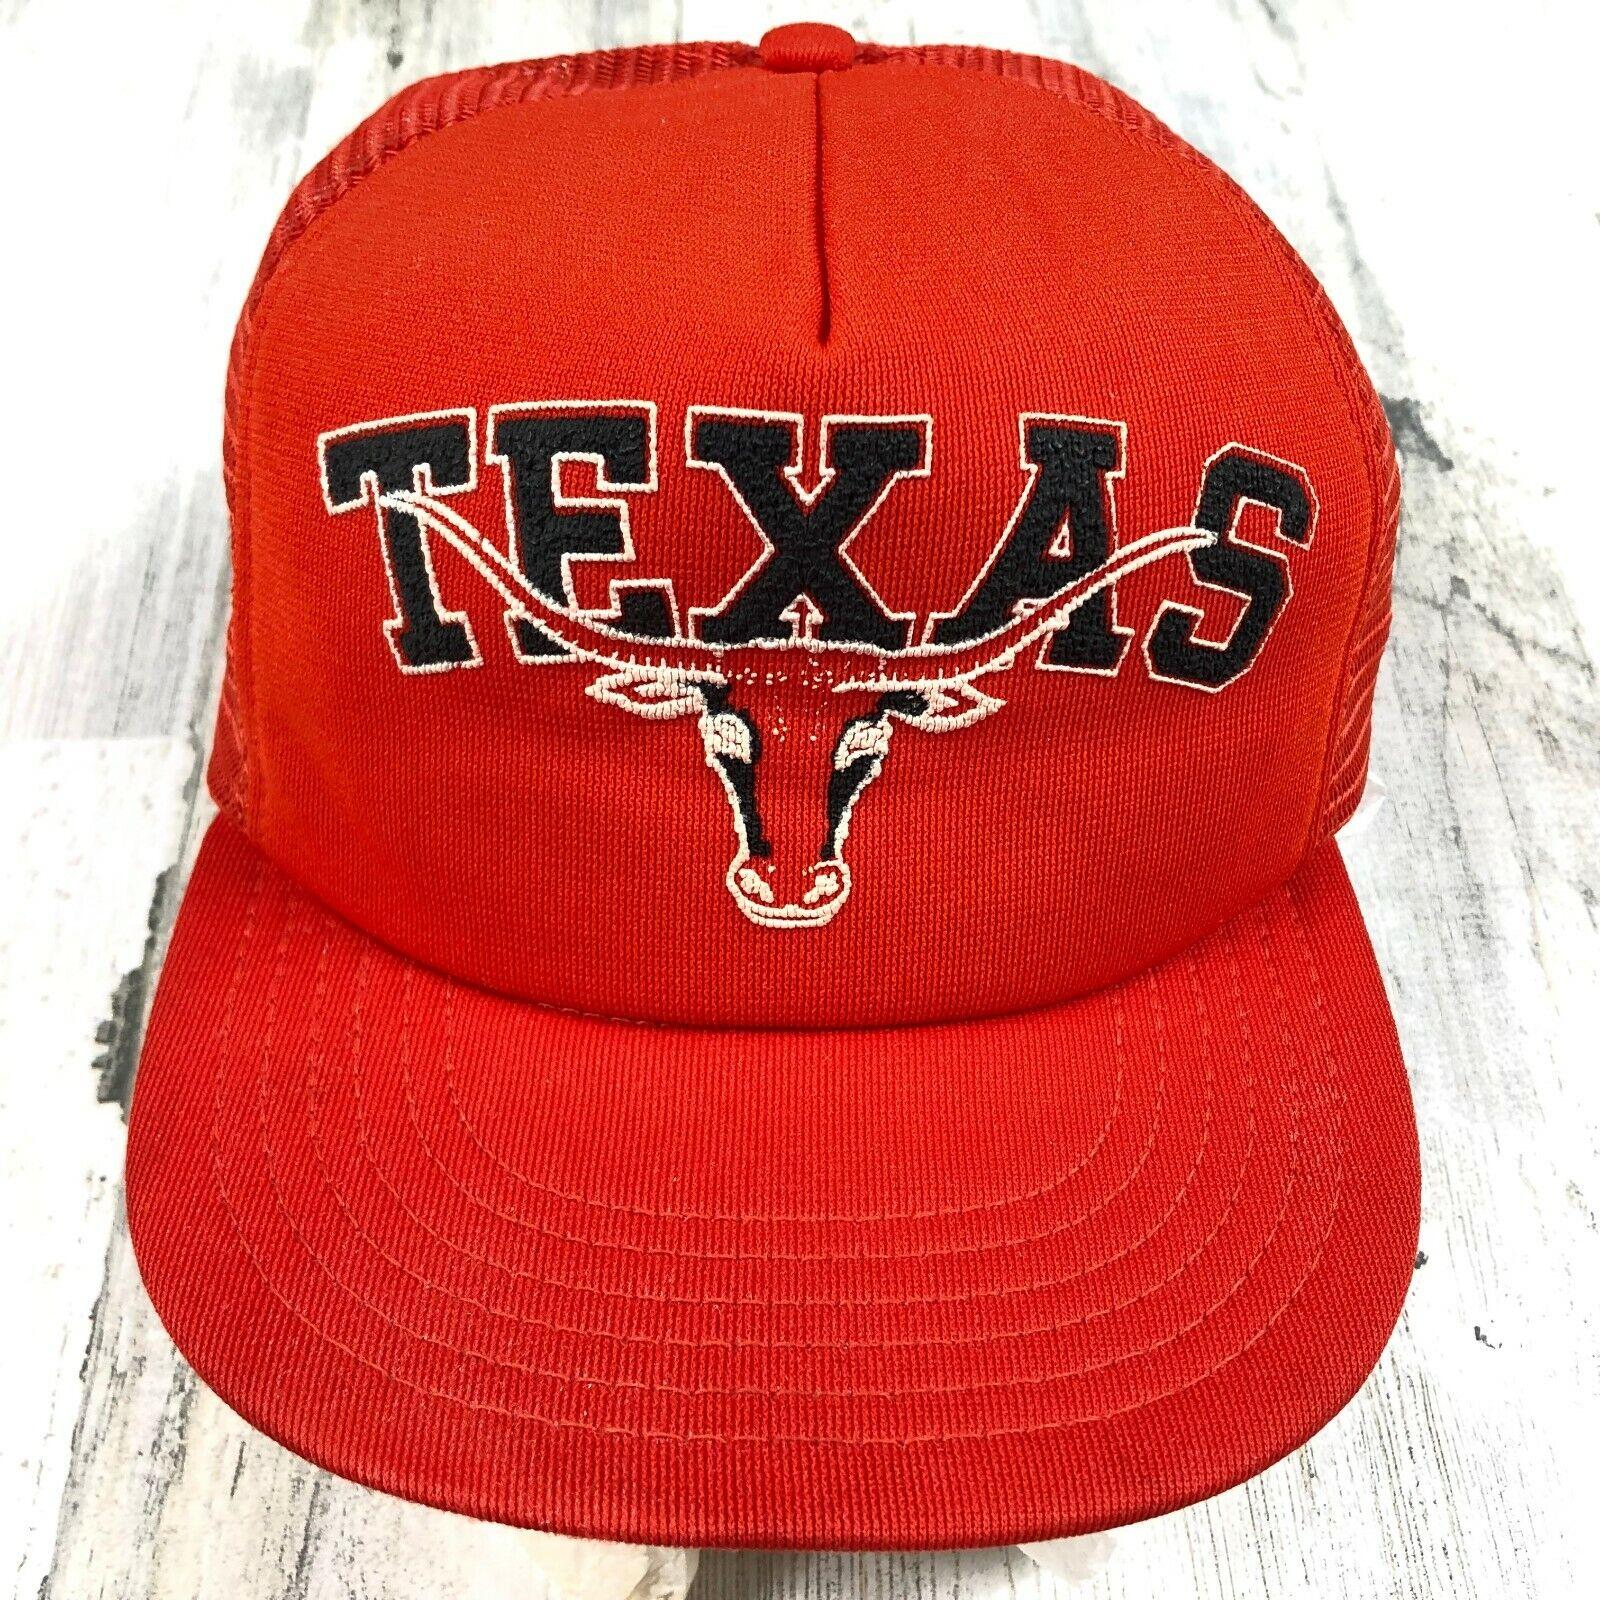 Vintage 80s Texas Longhorns Orange Snapback Meshback Trucker Hat Park Avenue USA